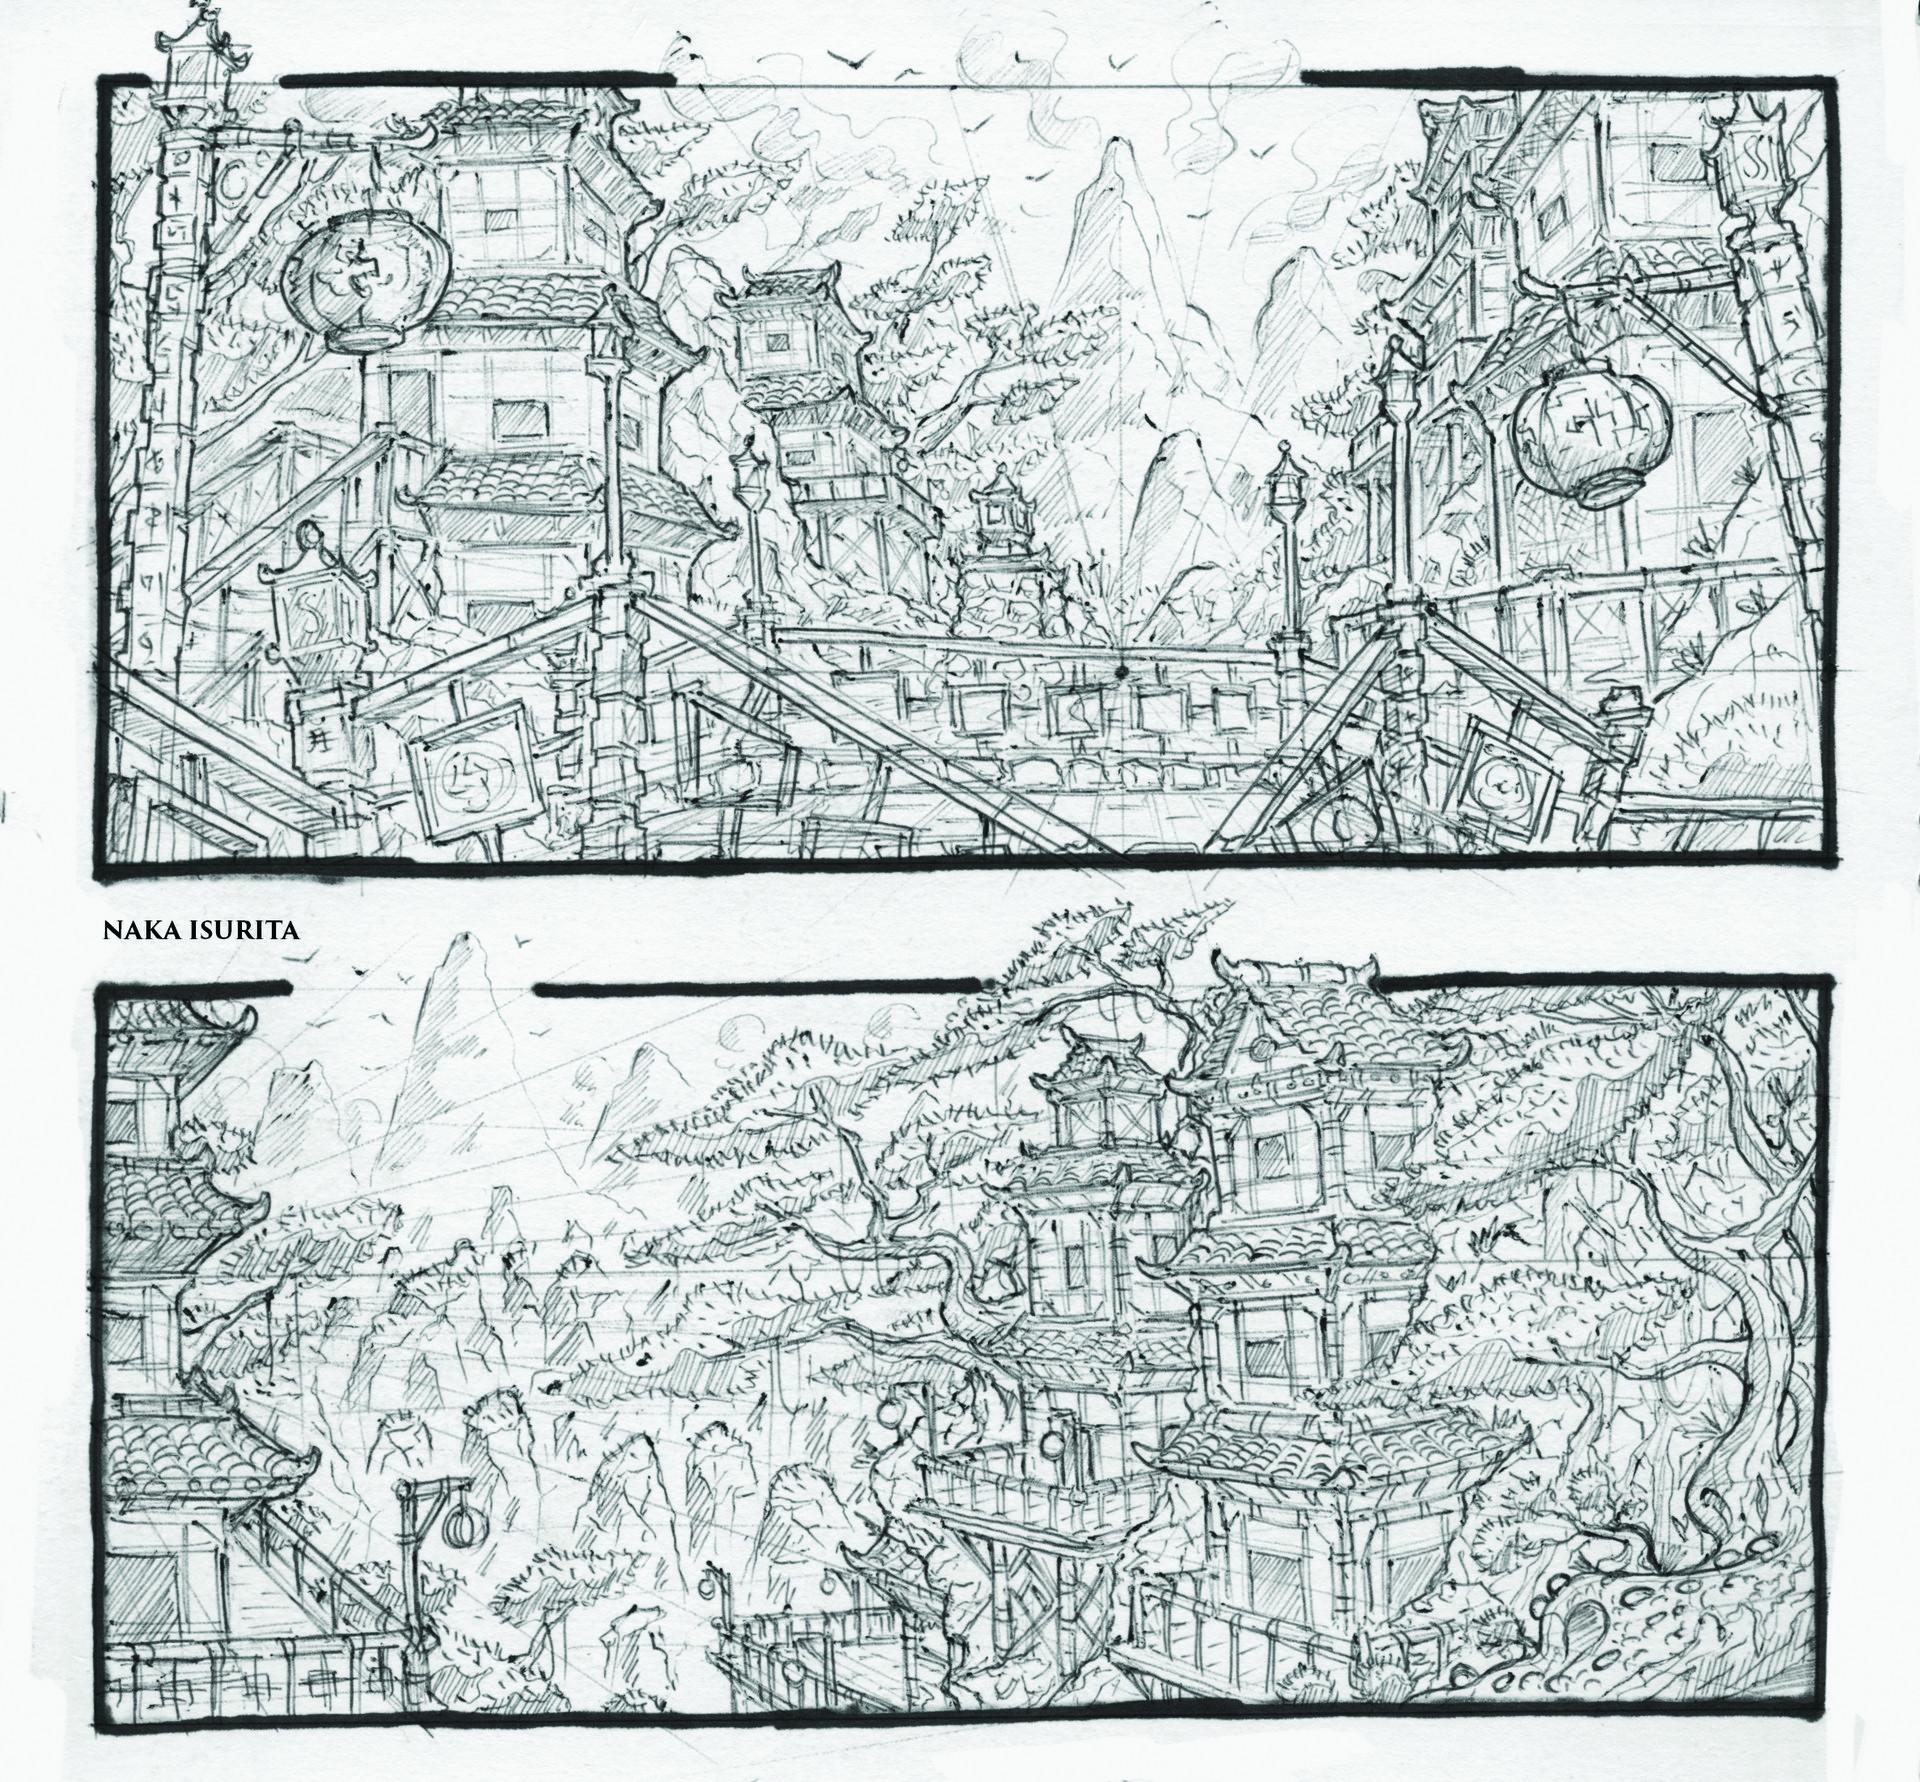 Naka isurita environment sketch 03